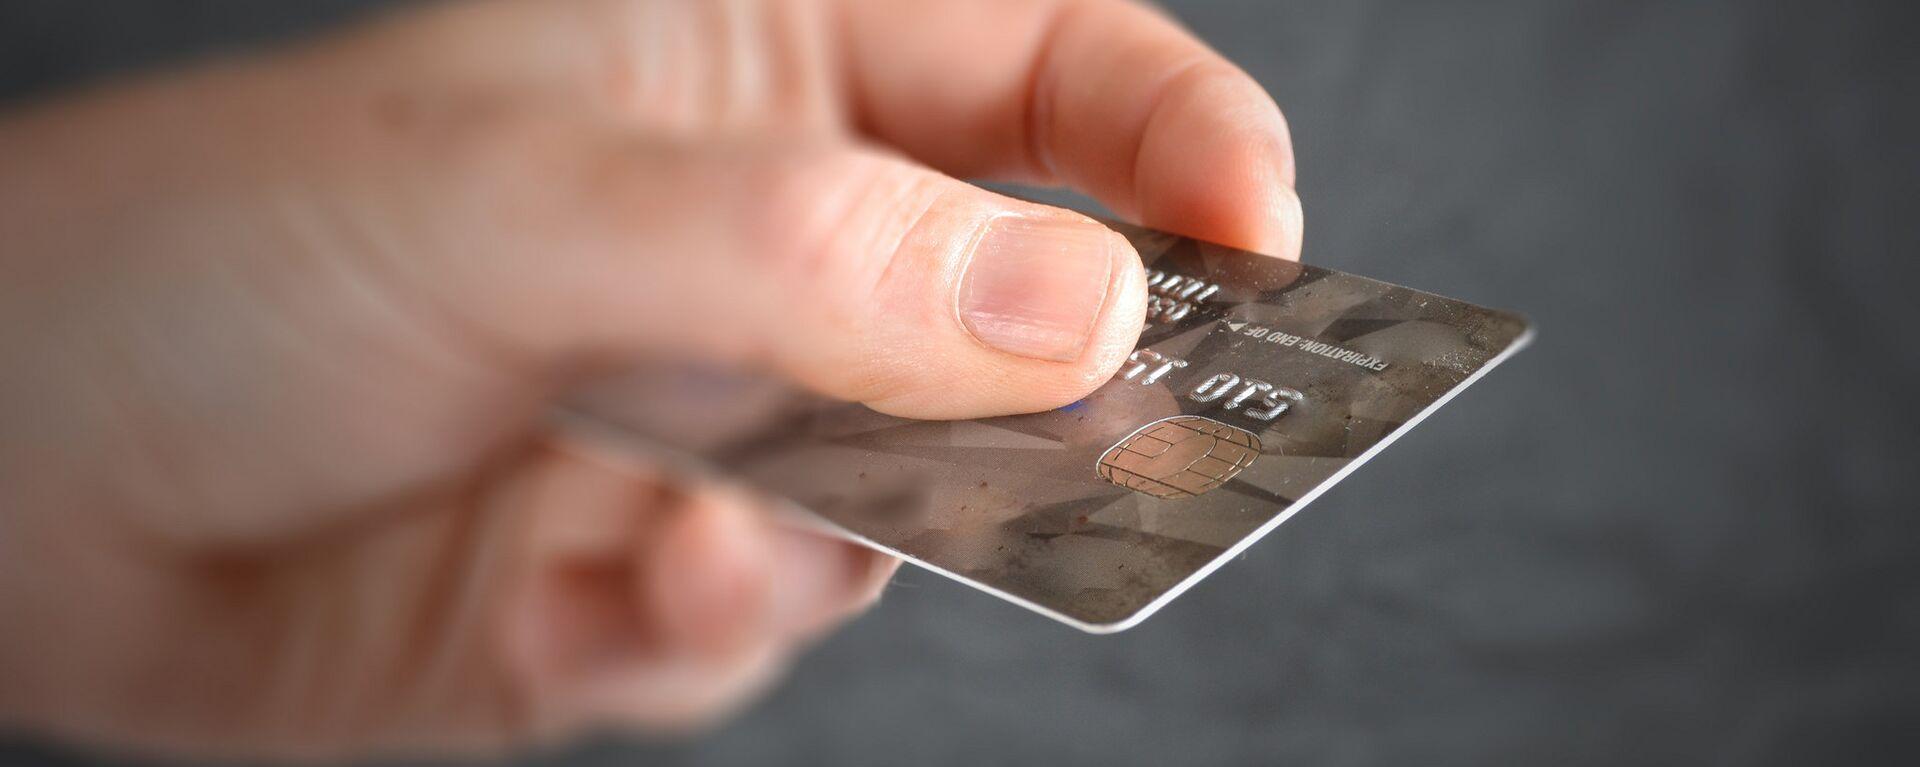 Paying with a Credit Card - Sputnik Mundo, 1920, 25.03.2021